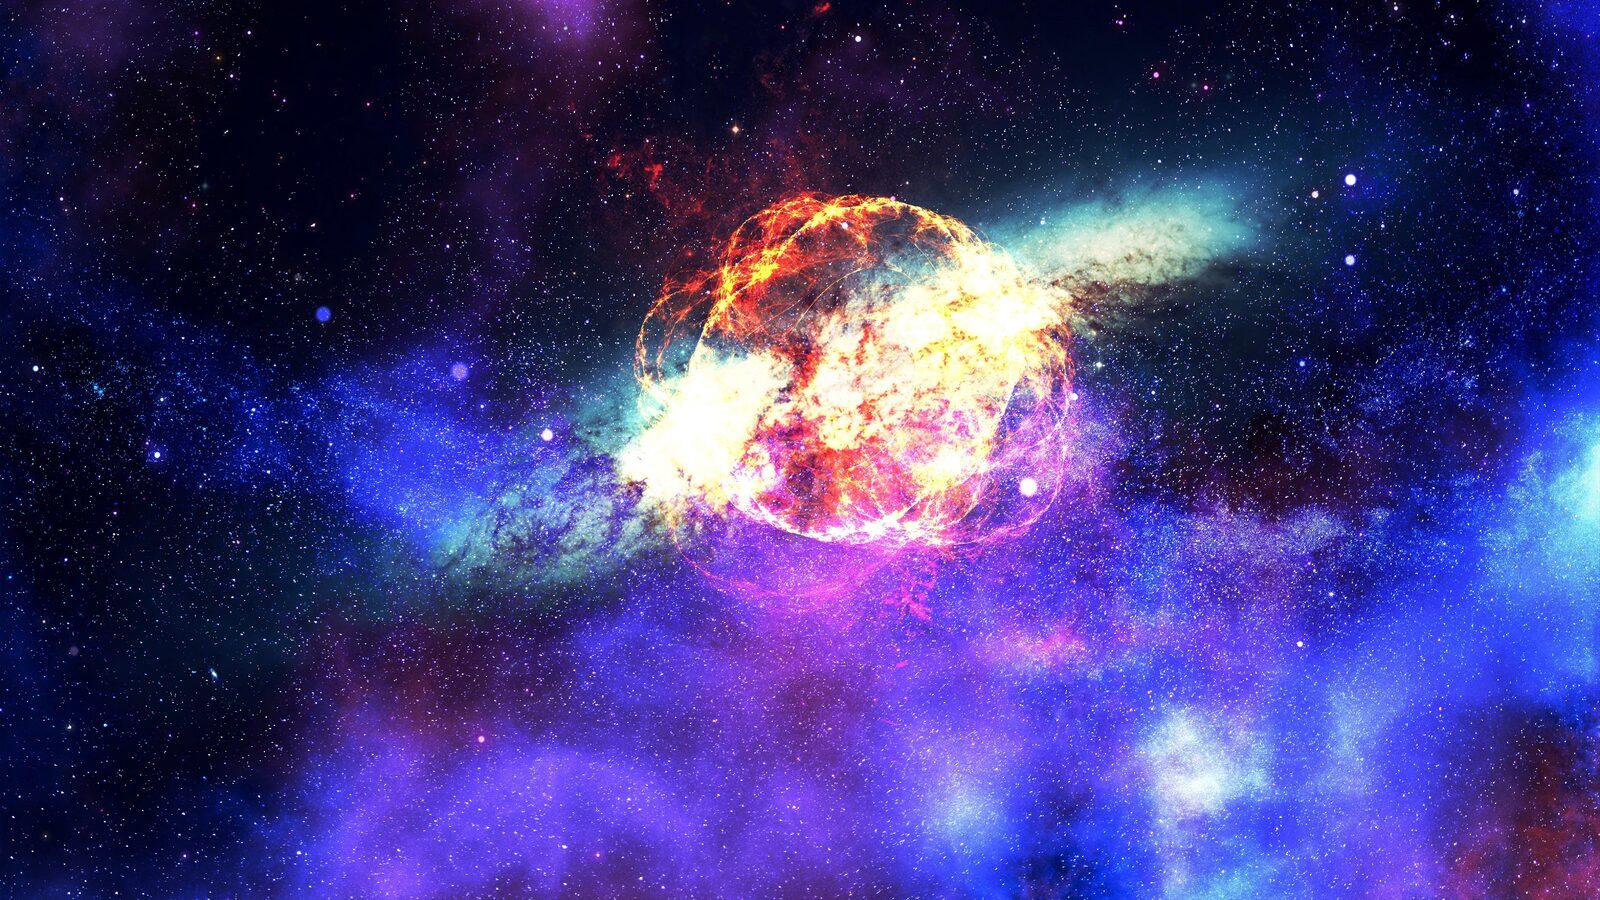 1600x900 Nebula Galaxy Outer Space 1600x900 Resolution HD ...